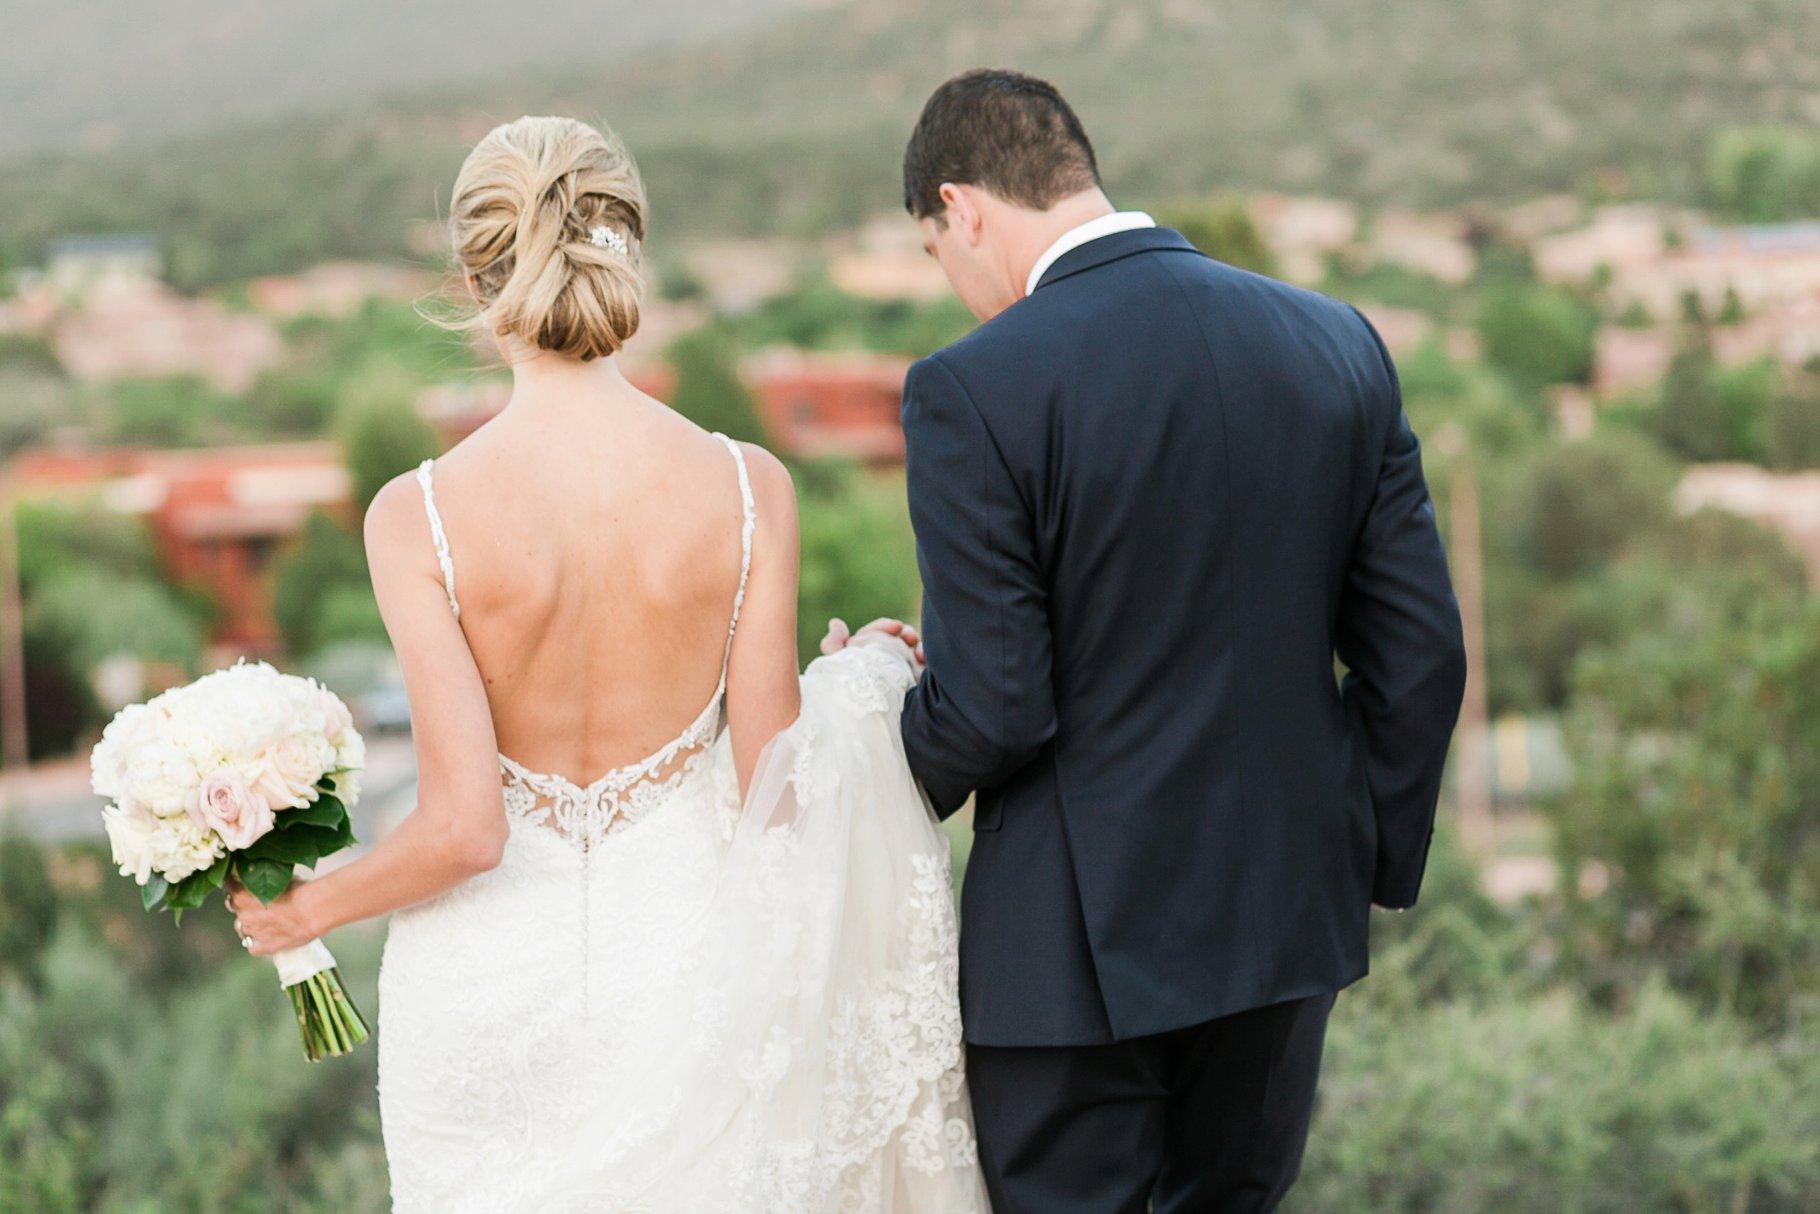 sedona wedding-121_GRETCHEN WAKEMAN PHOTOGRAPHY.jpg